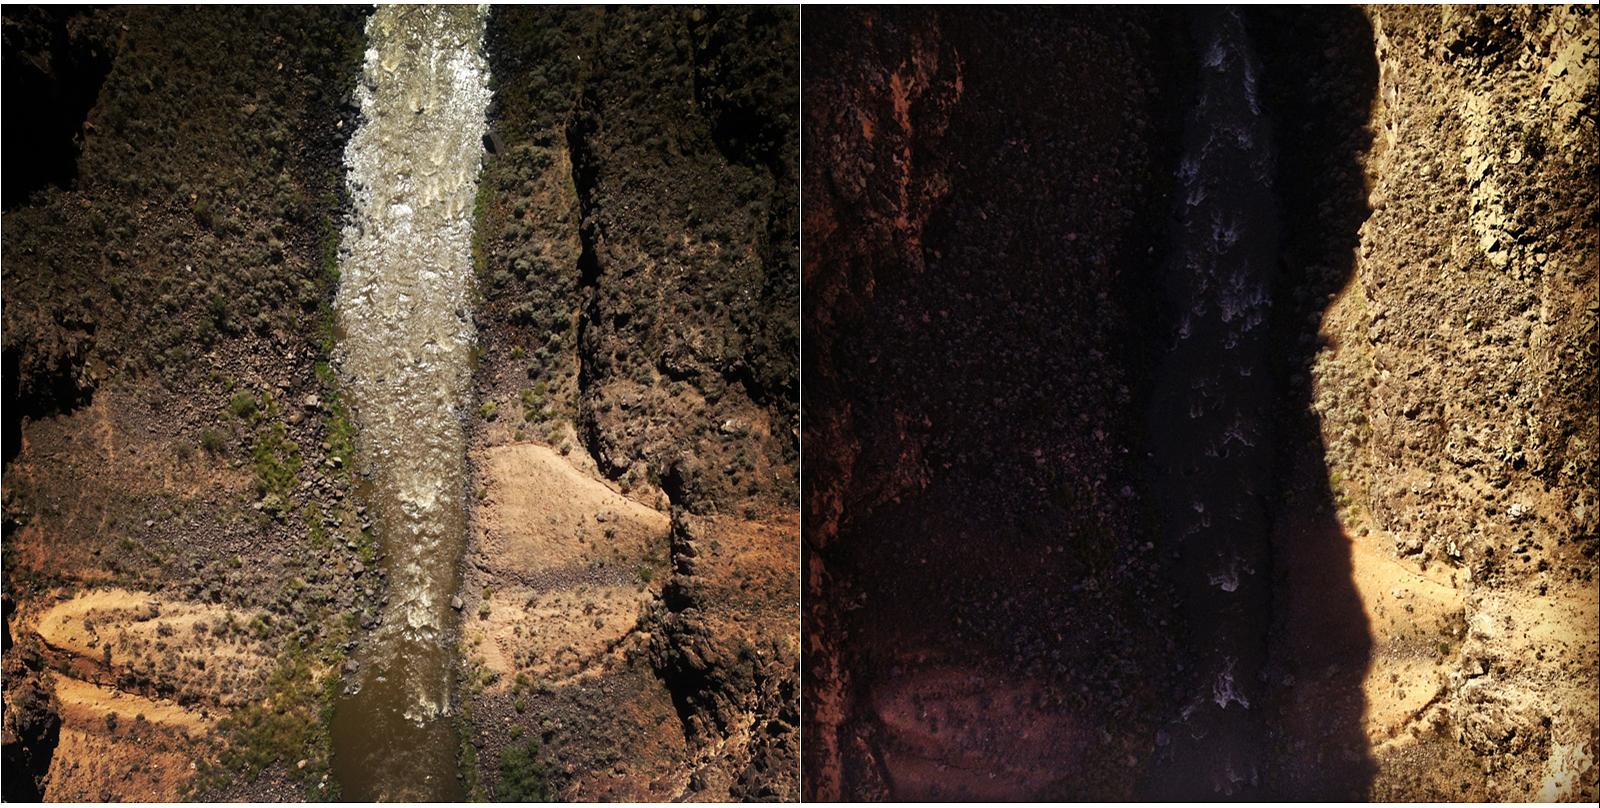 600 Feet (Rio Grande Gorge Bridge) , 2014 Digital inkjet prints 16 x 16 inches each